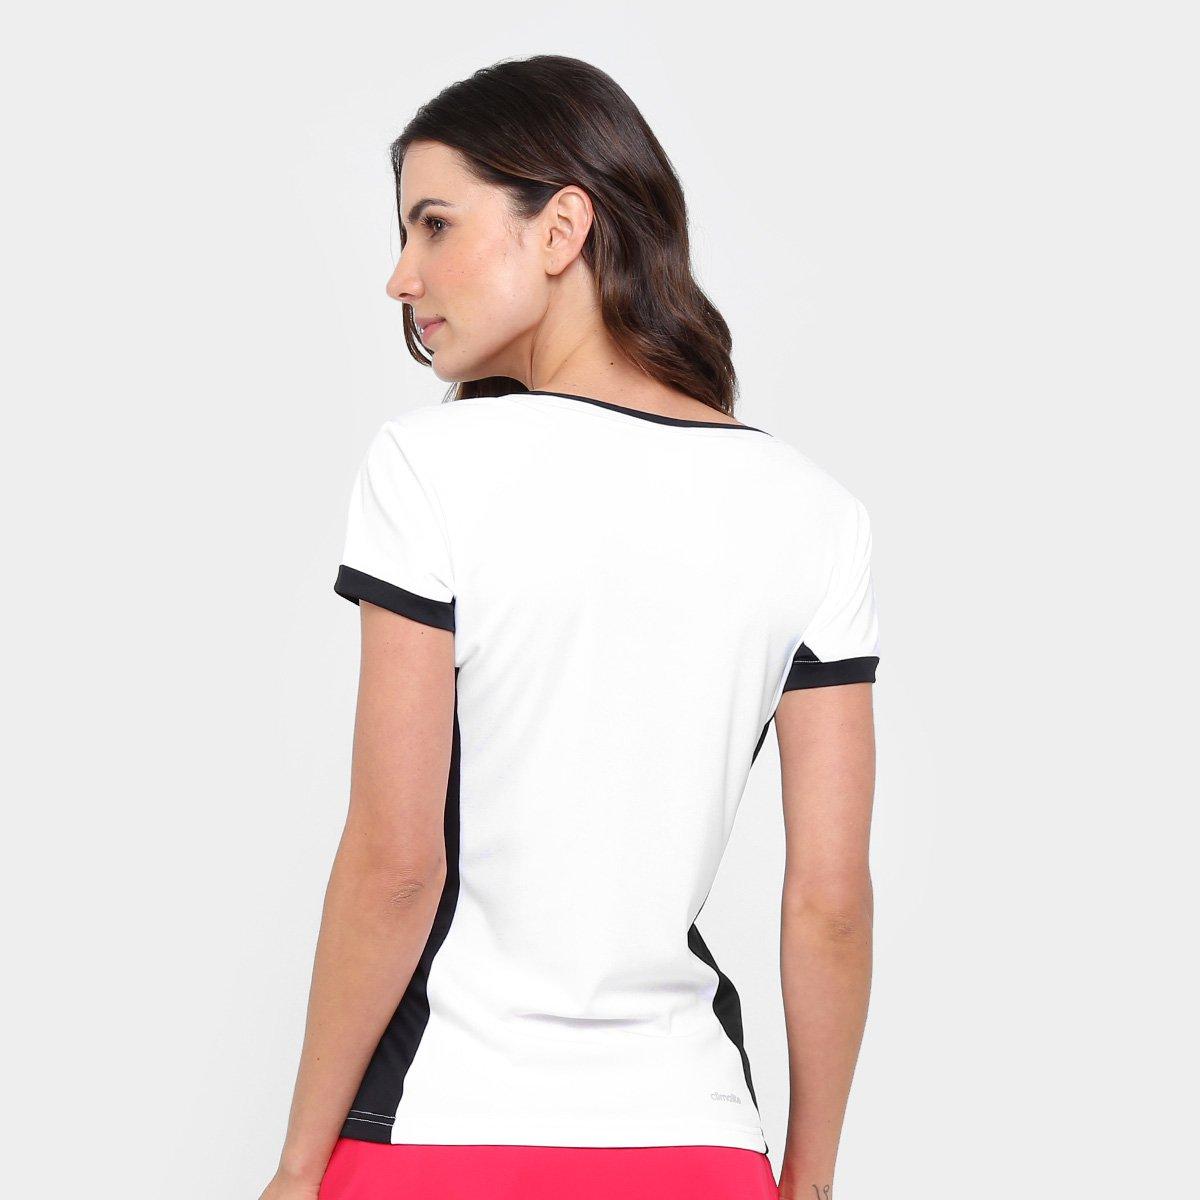 Camiseta Adidas Court W Feminina - Compre Agora  fe3c9ea279e72